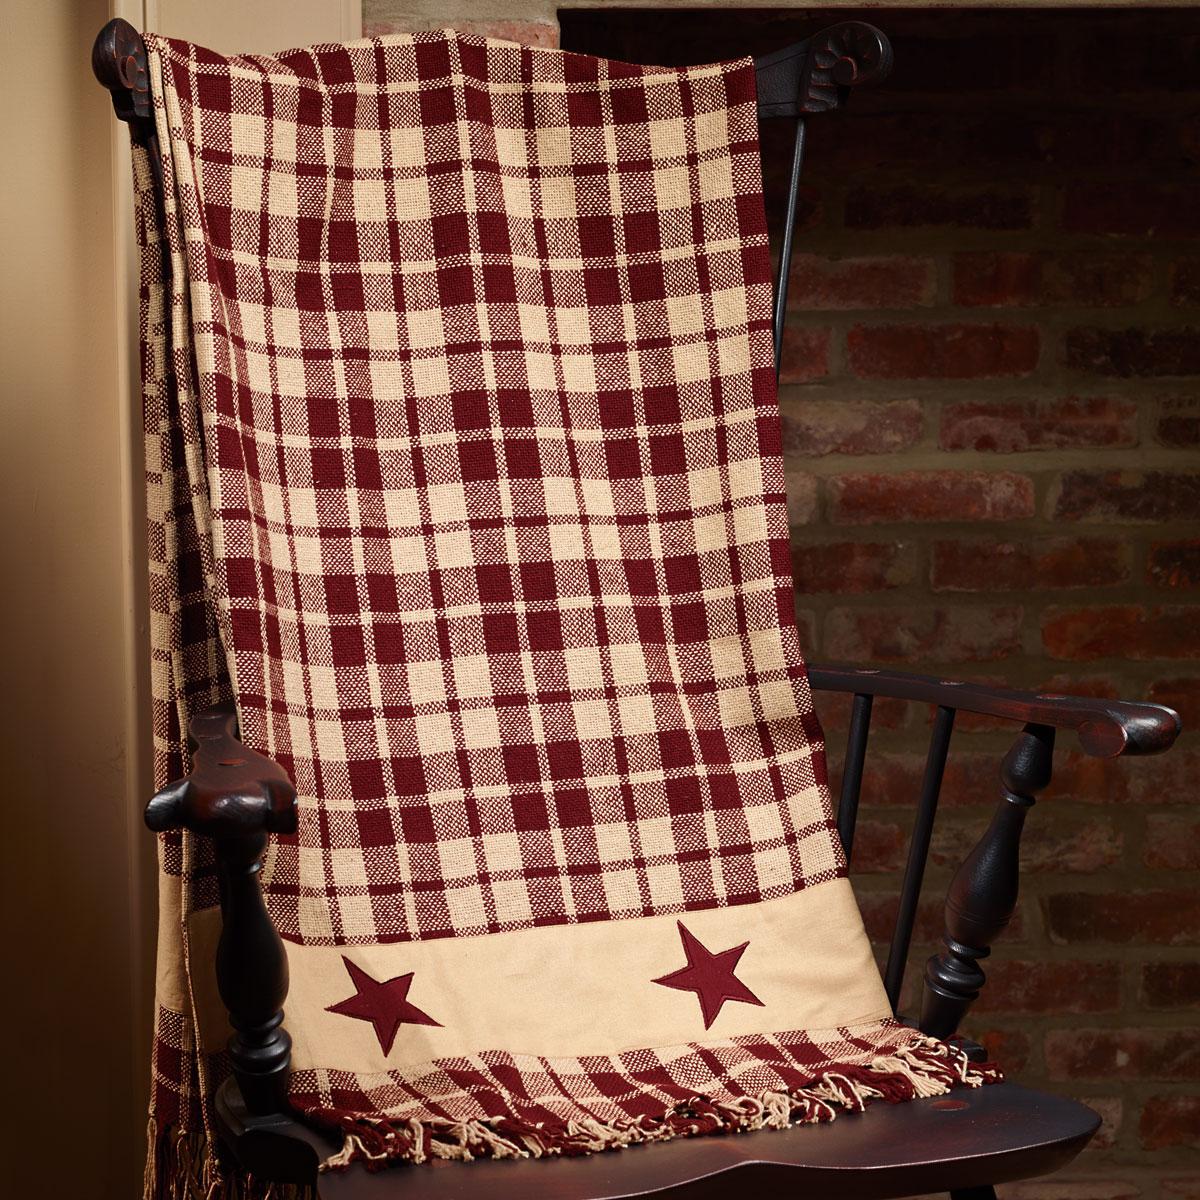 Primitive Farmhouse Star Country Throw Blanket Burgundy